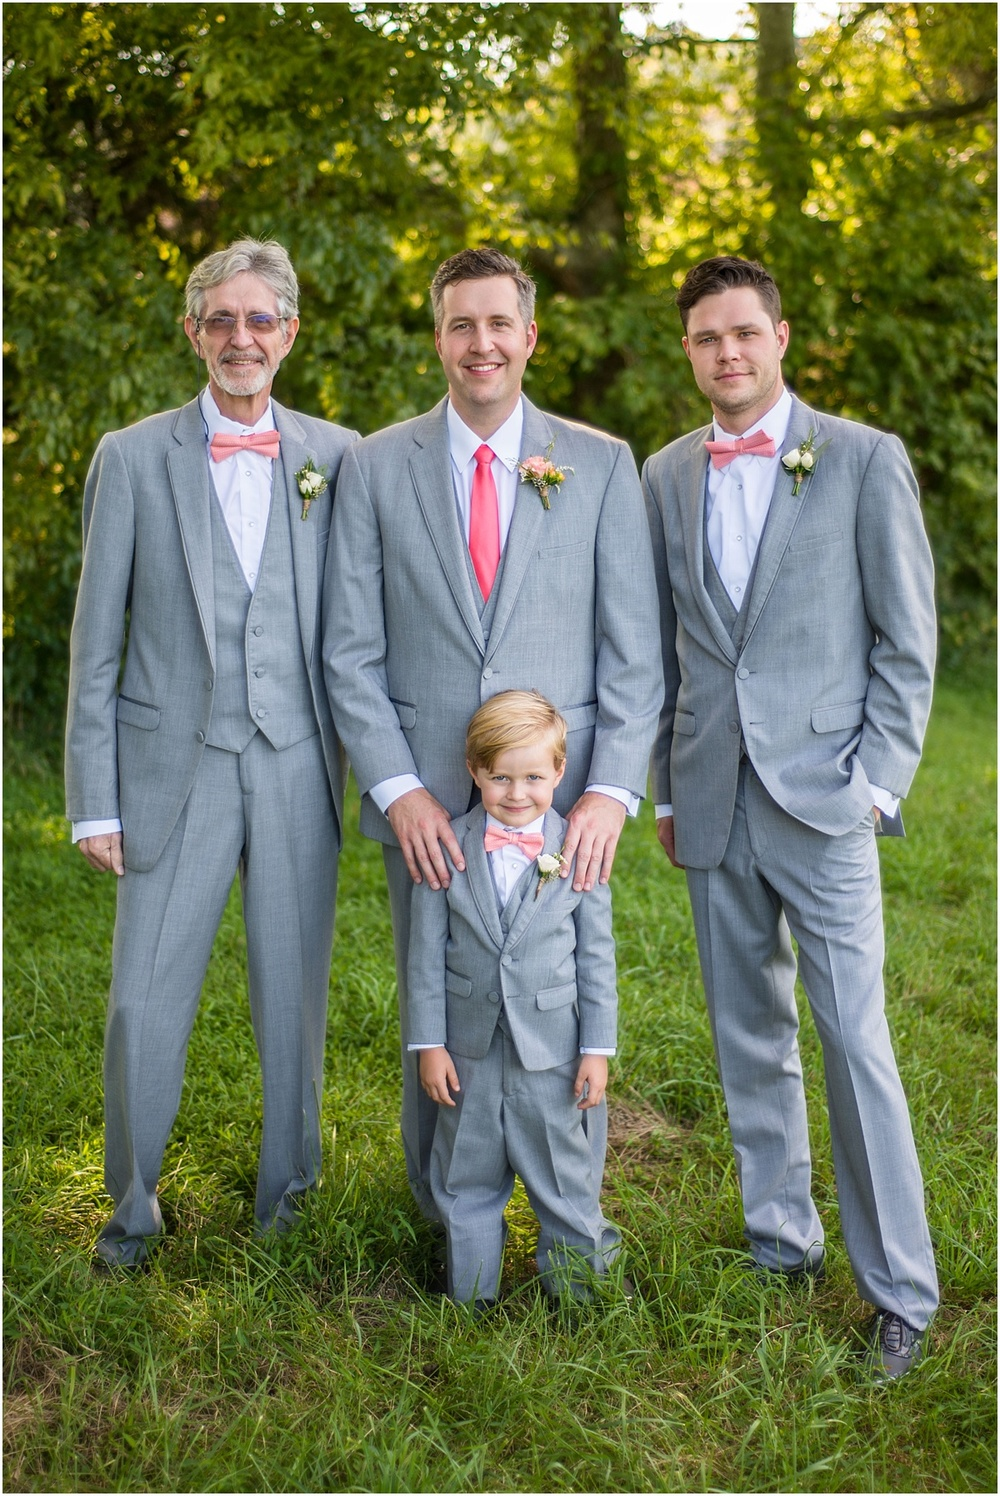 Greg Smit Photography Nashville wedding photographer Mint Springs Farm_0085